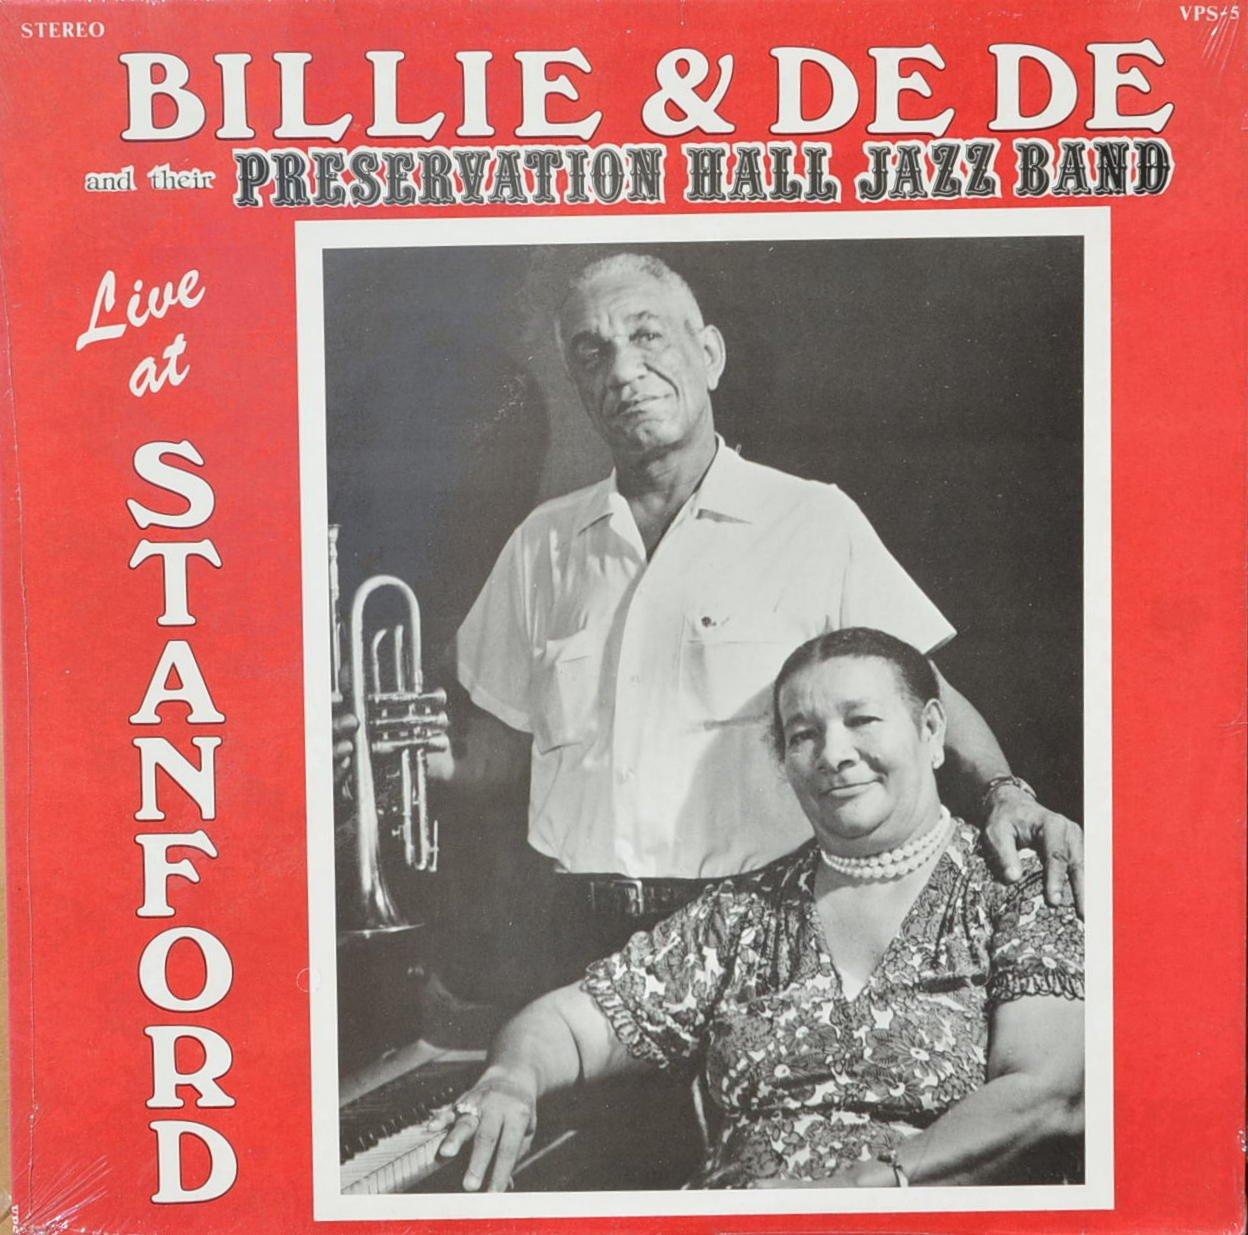 Billie & De De & Their Preservation Hall Jazz Band Live at Stanford : Milneburg Joys; Dippermouth Blues; St. Louis Blues; Don't the Moon Look Lonesome Blues; Bille & De De's Boogie Woogie